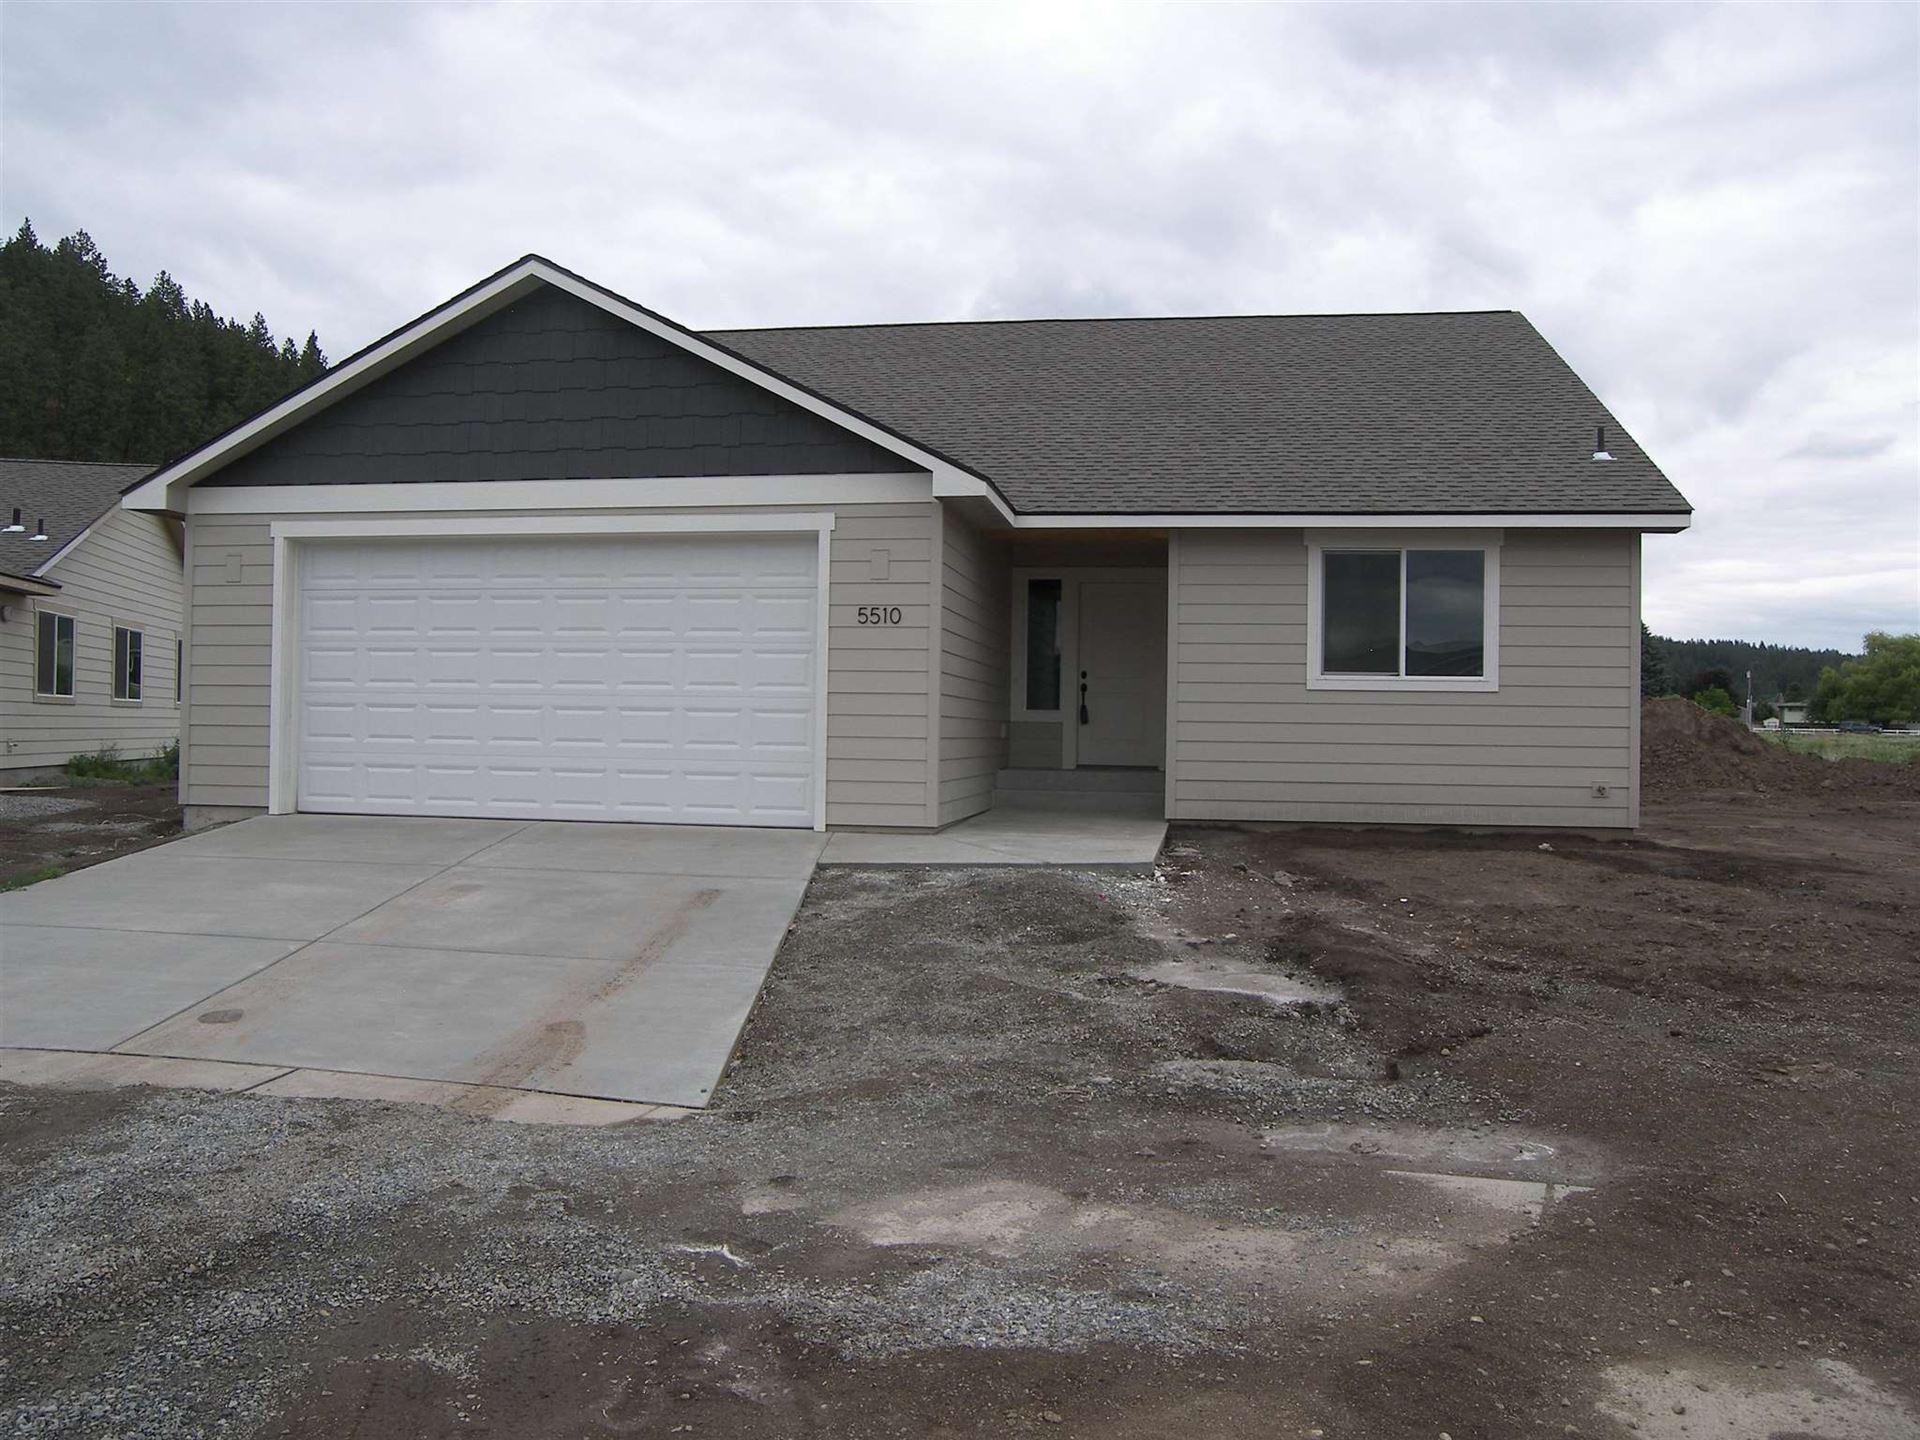 5510 N Mathis Ct, Spokane Valley, WA 99216 - #: 202117180